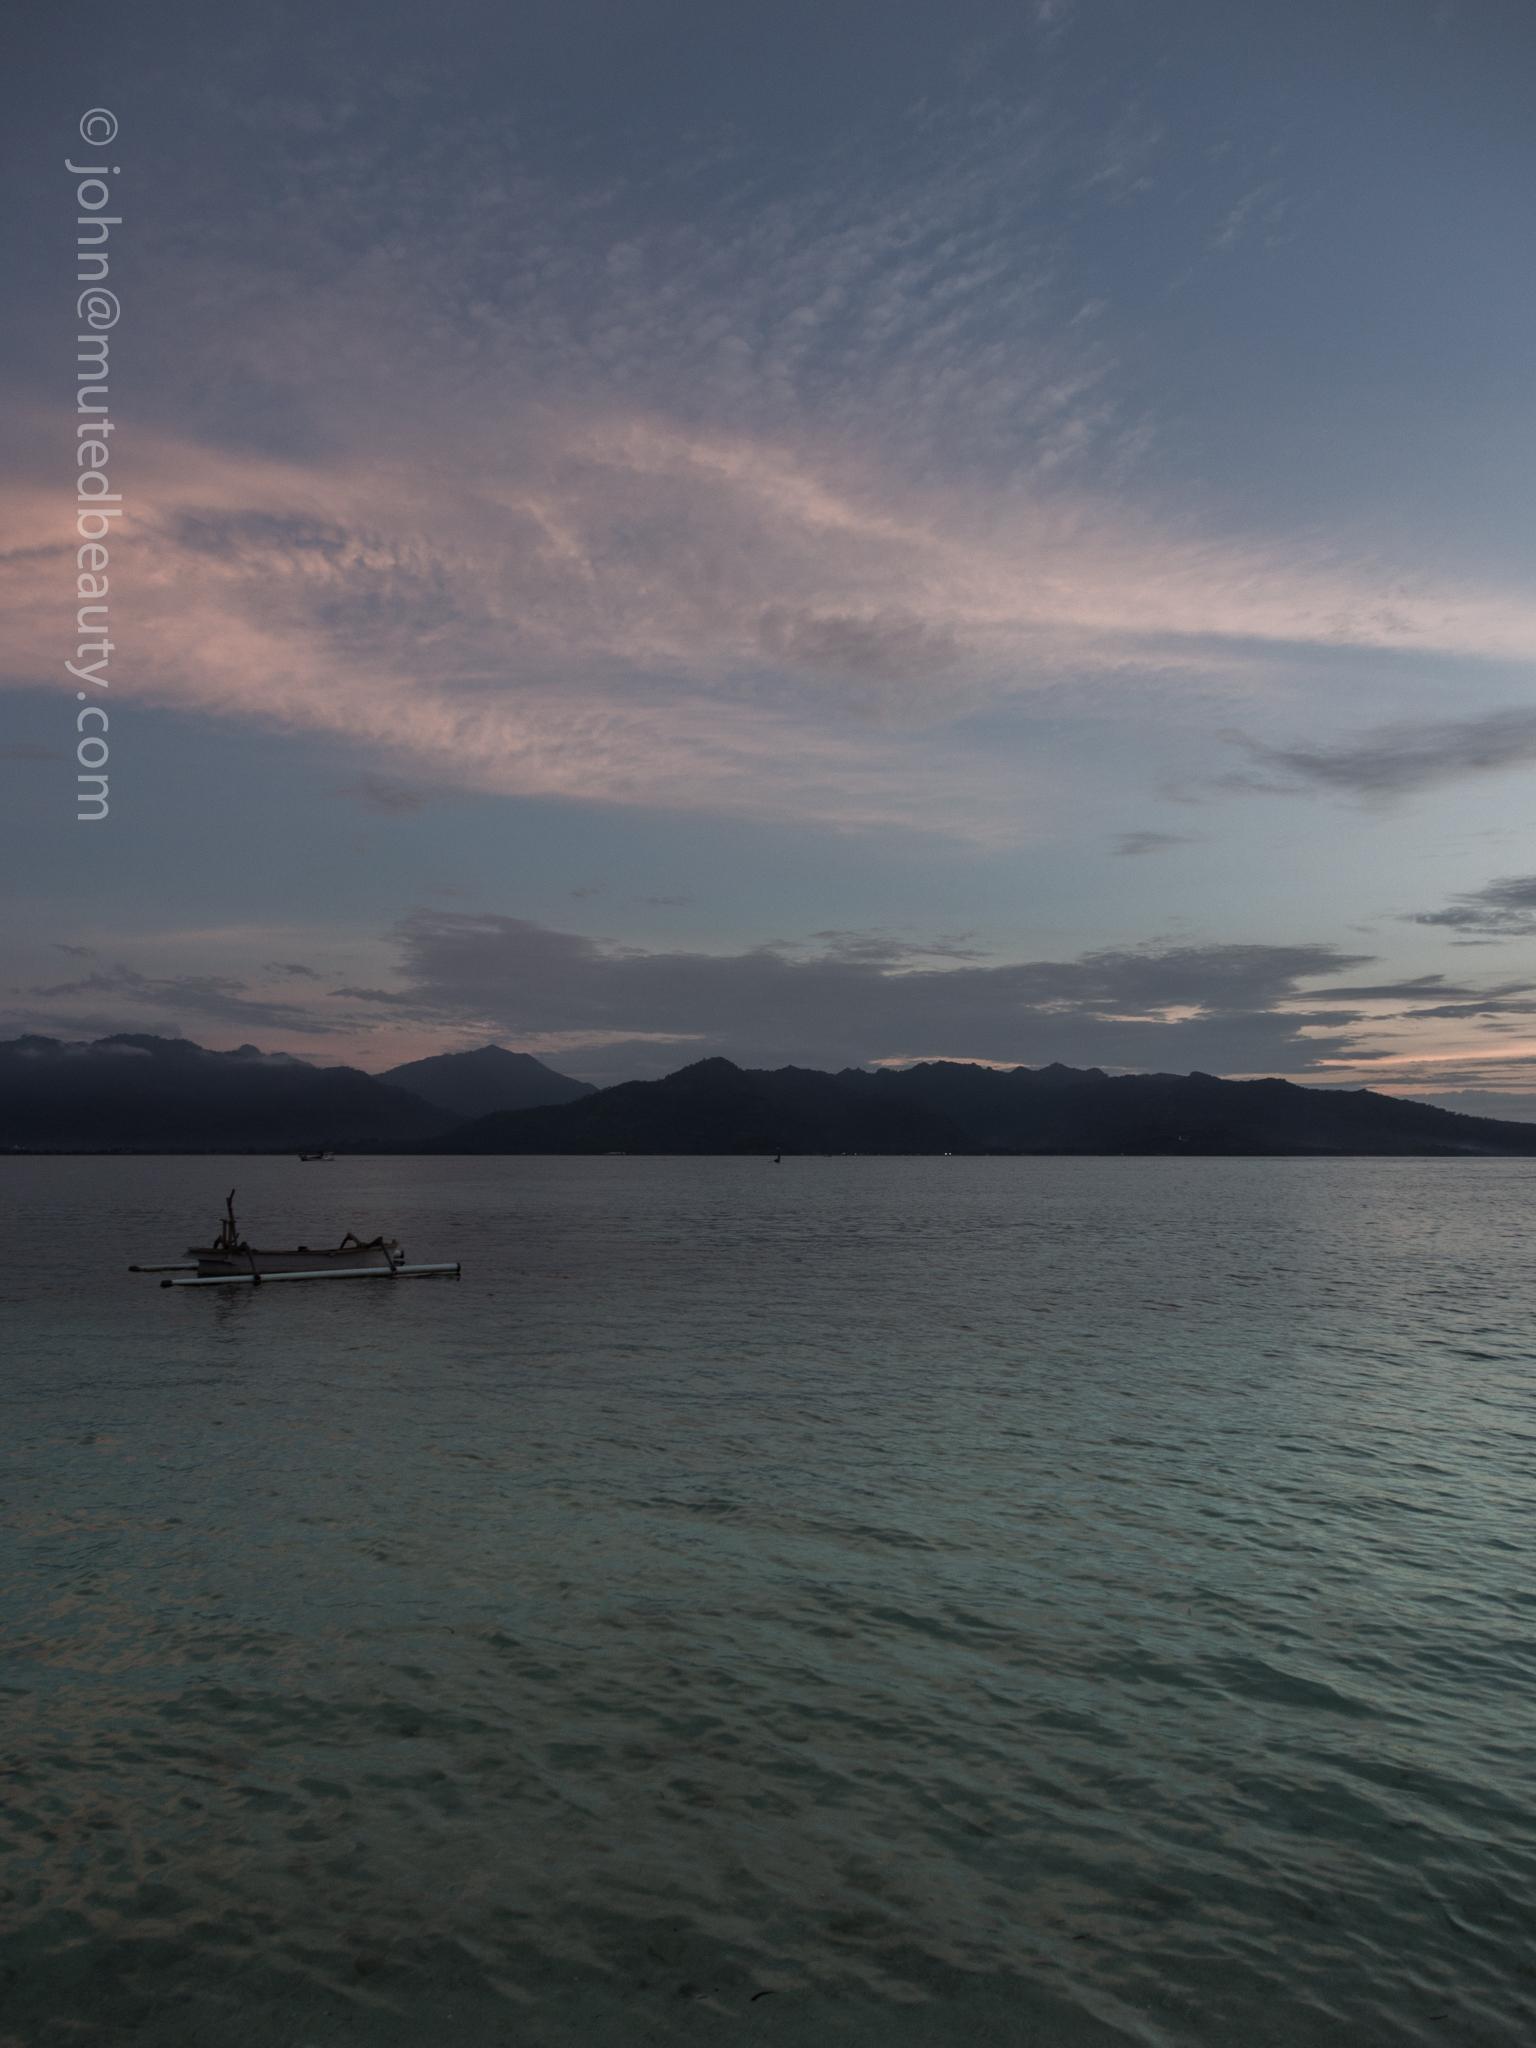 Gili Air, Indonesia - February 2017